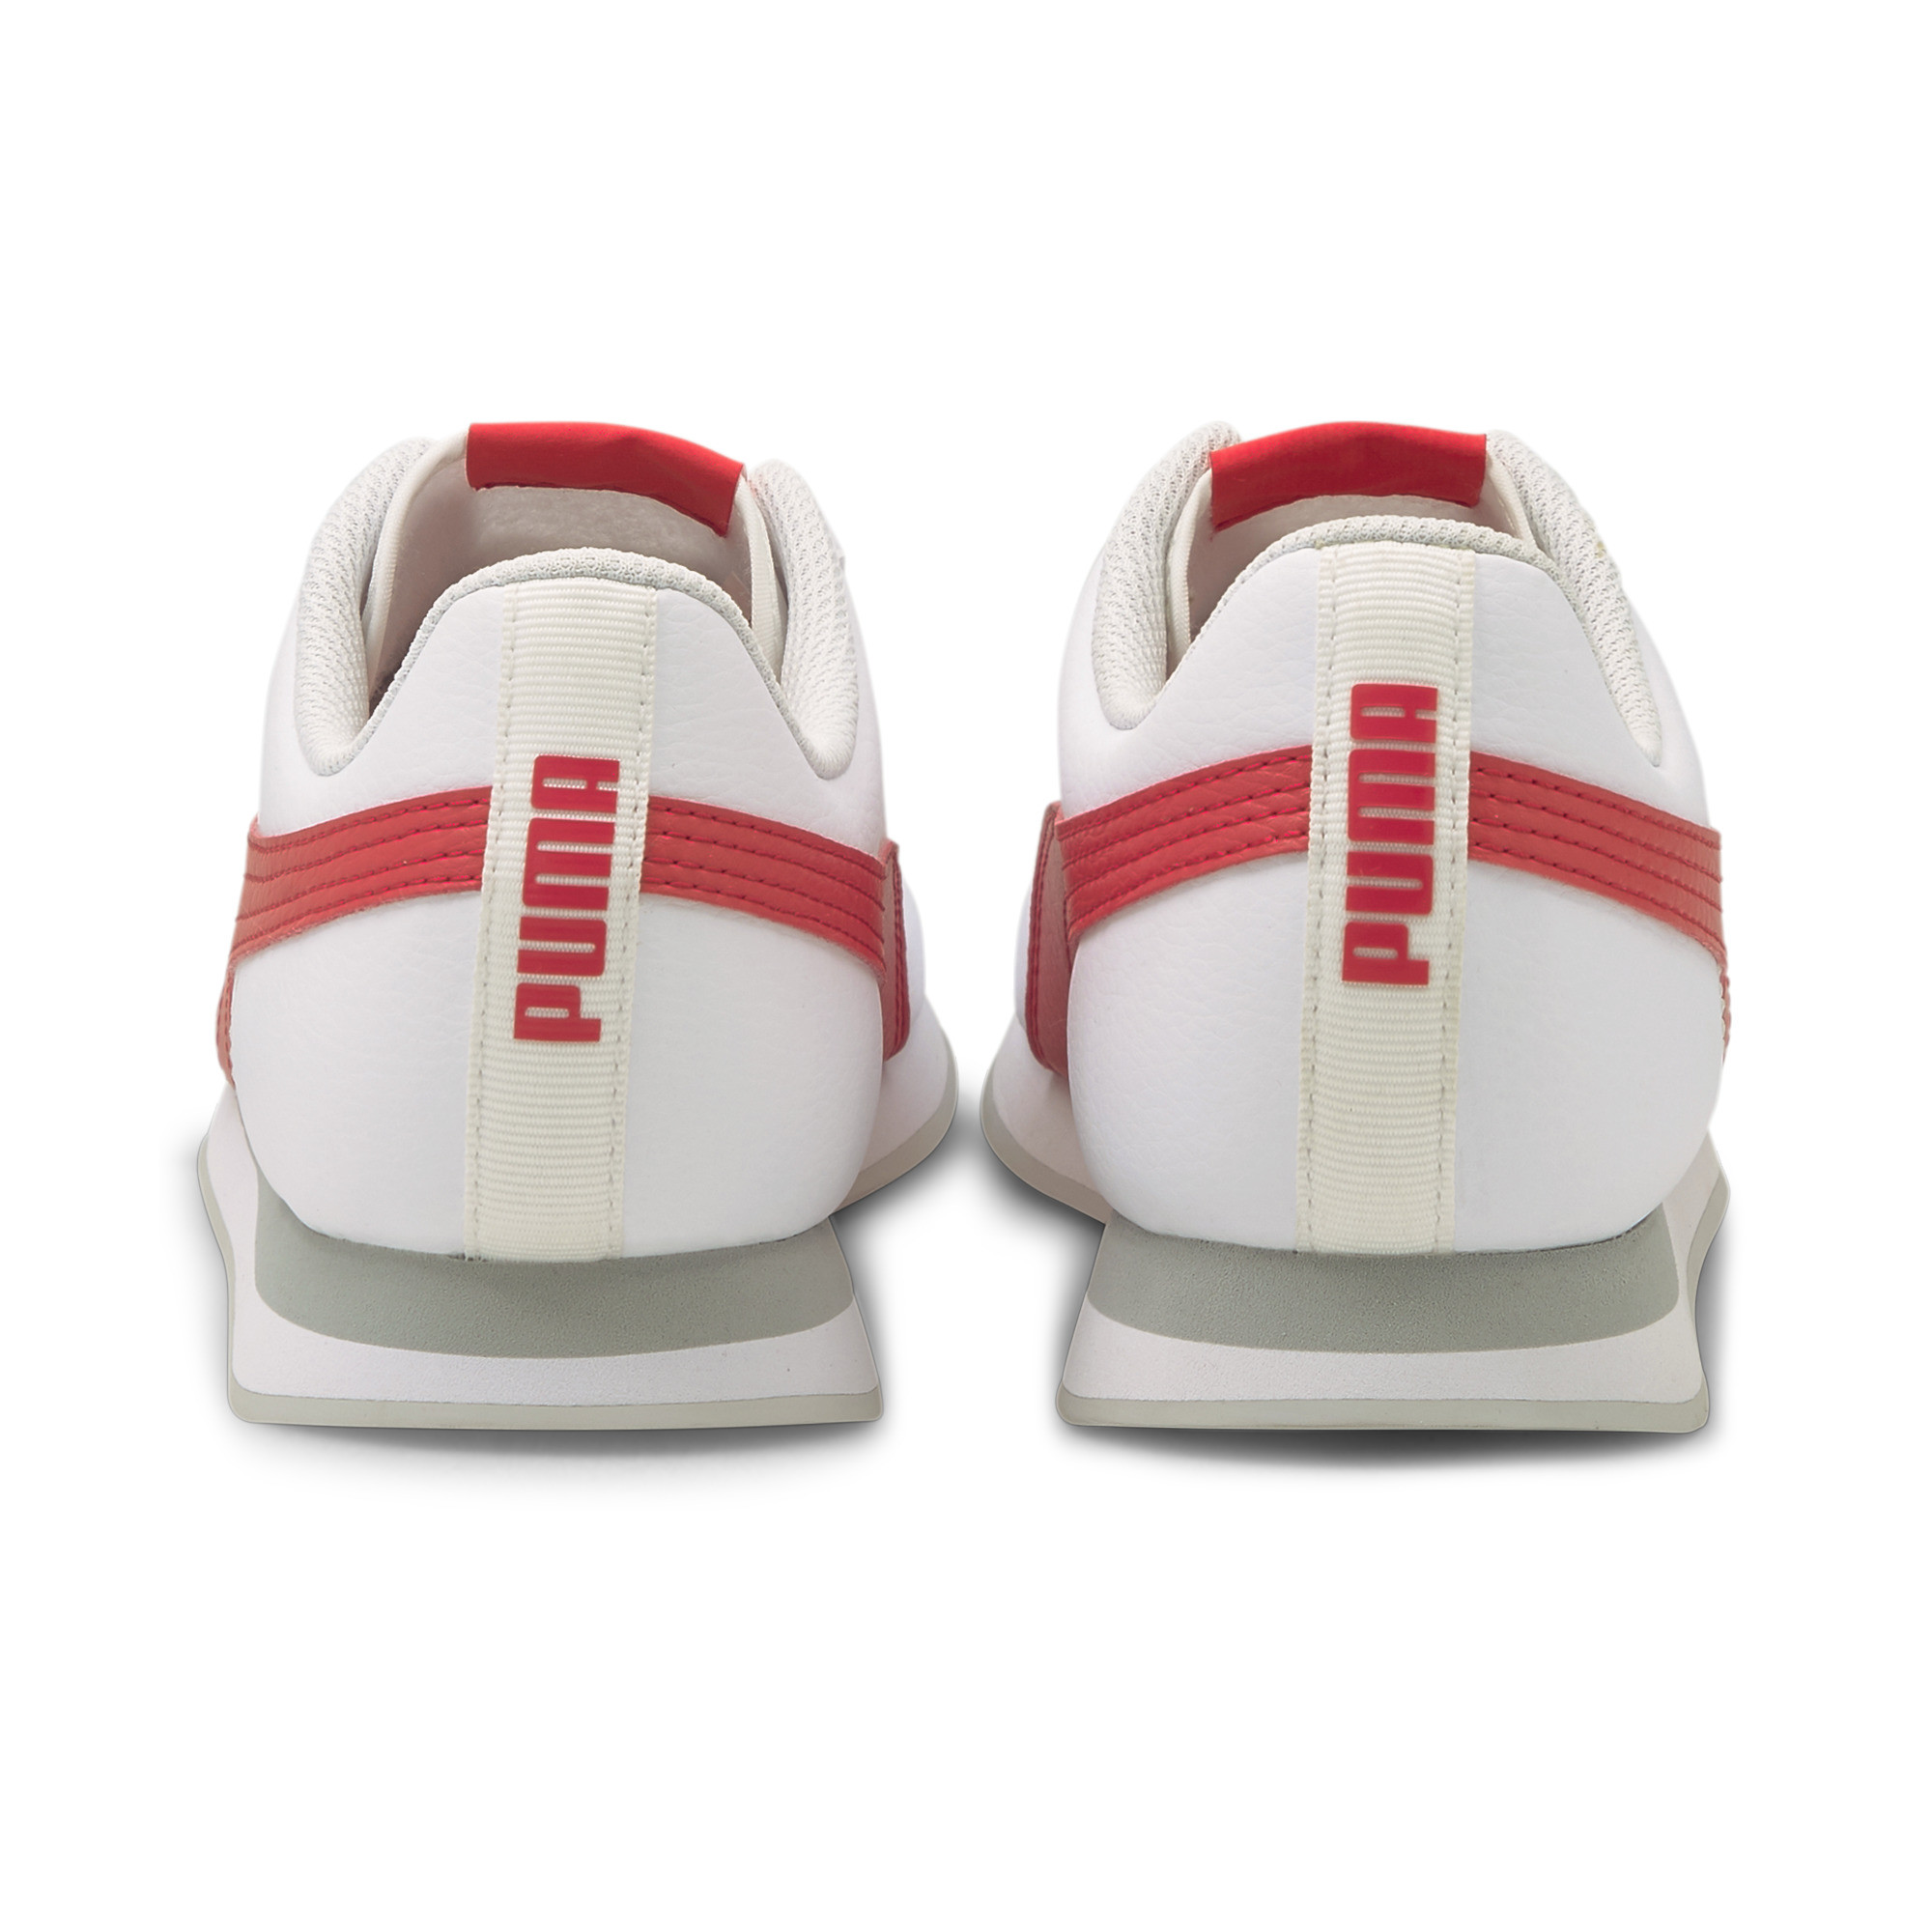 thumbnail 40 - PUMA Men's Turin II Sneakers